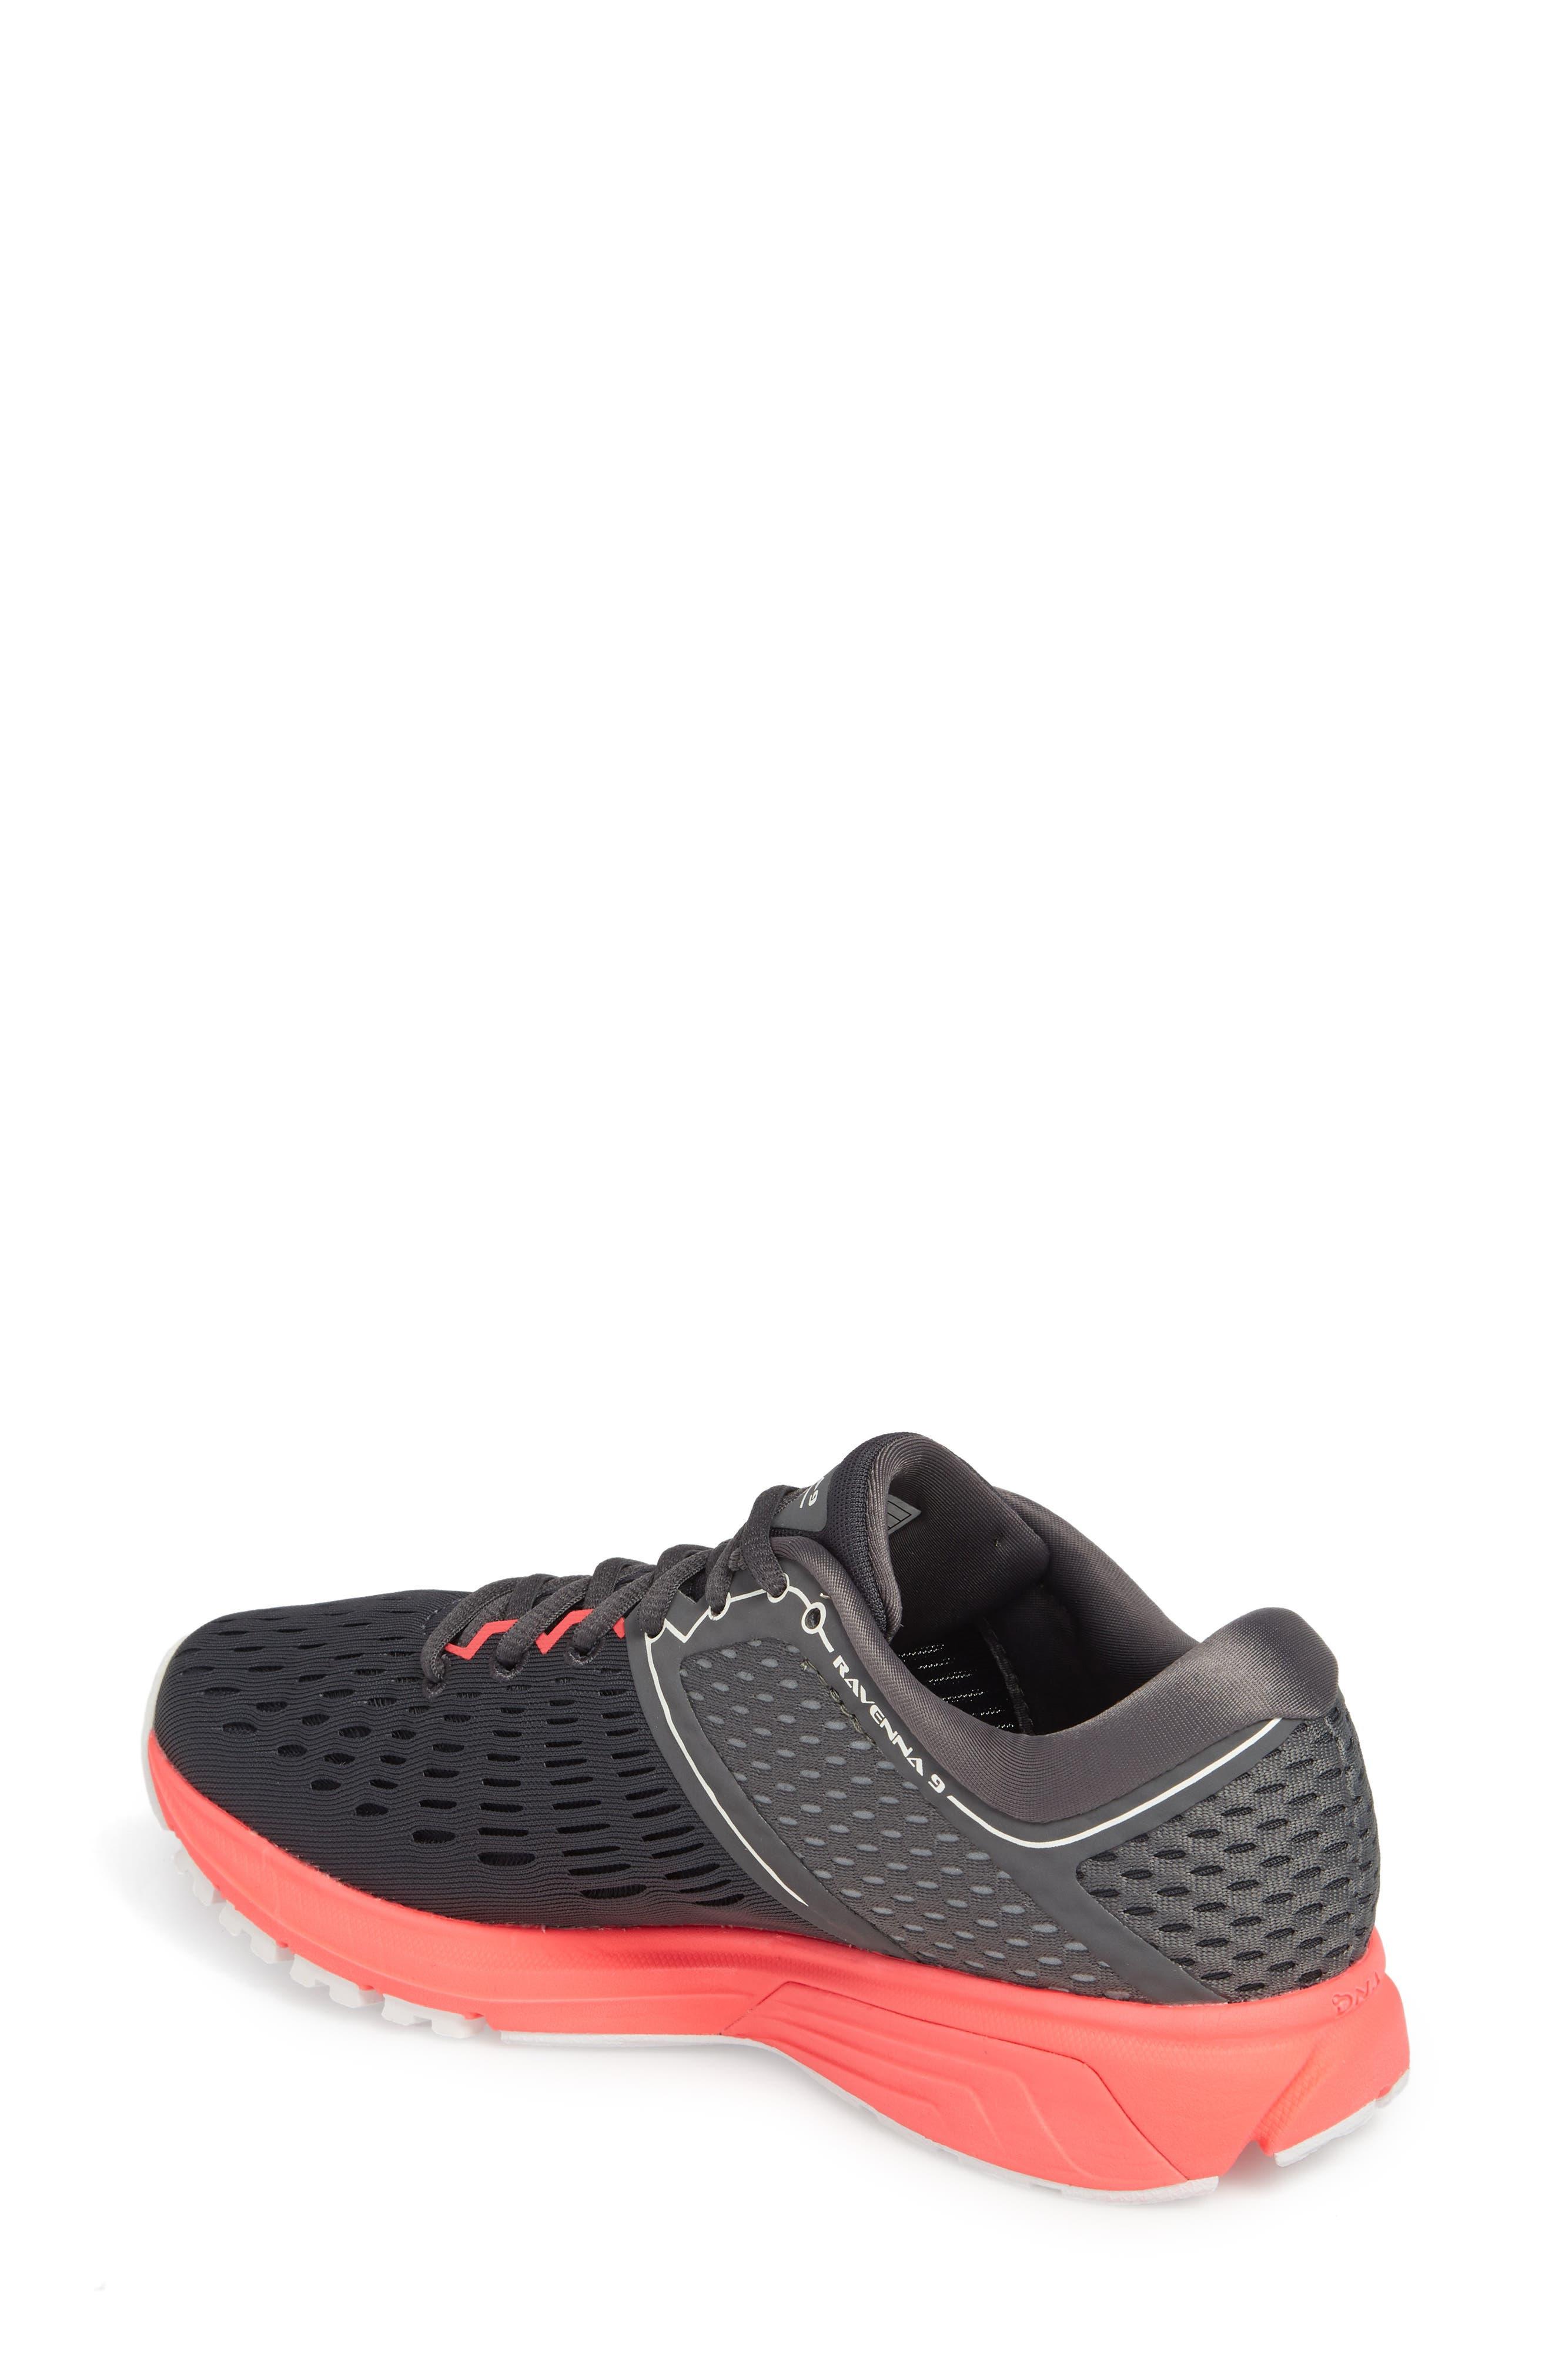 Ravenna 9 Running Shoe,                             Alternate thumbnail 2, color,                             EBONY/ DIVA PINK/ WHITE